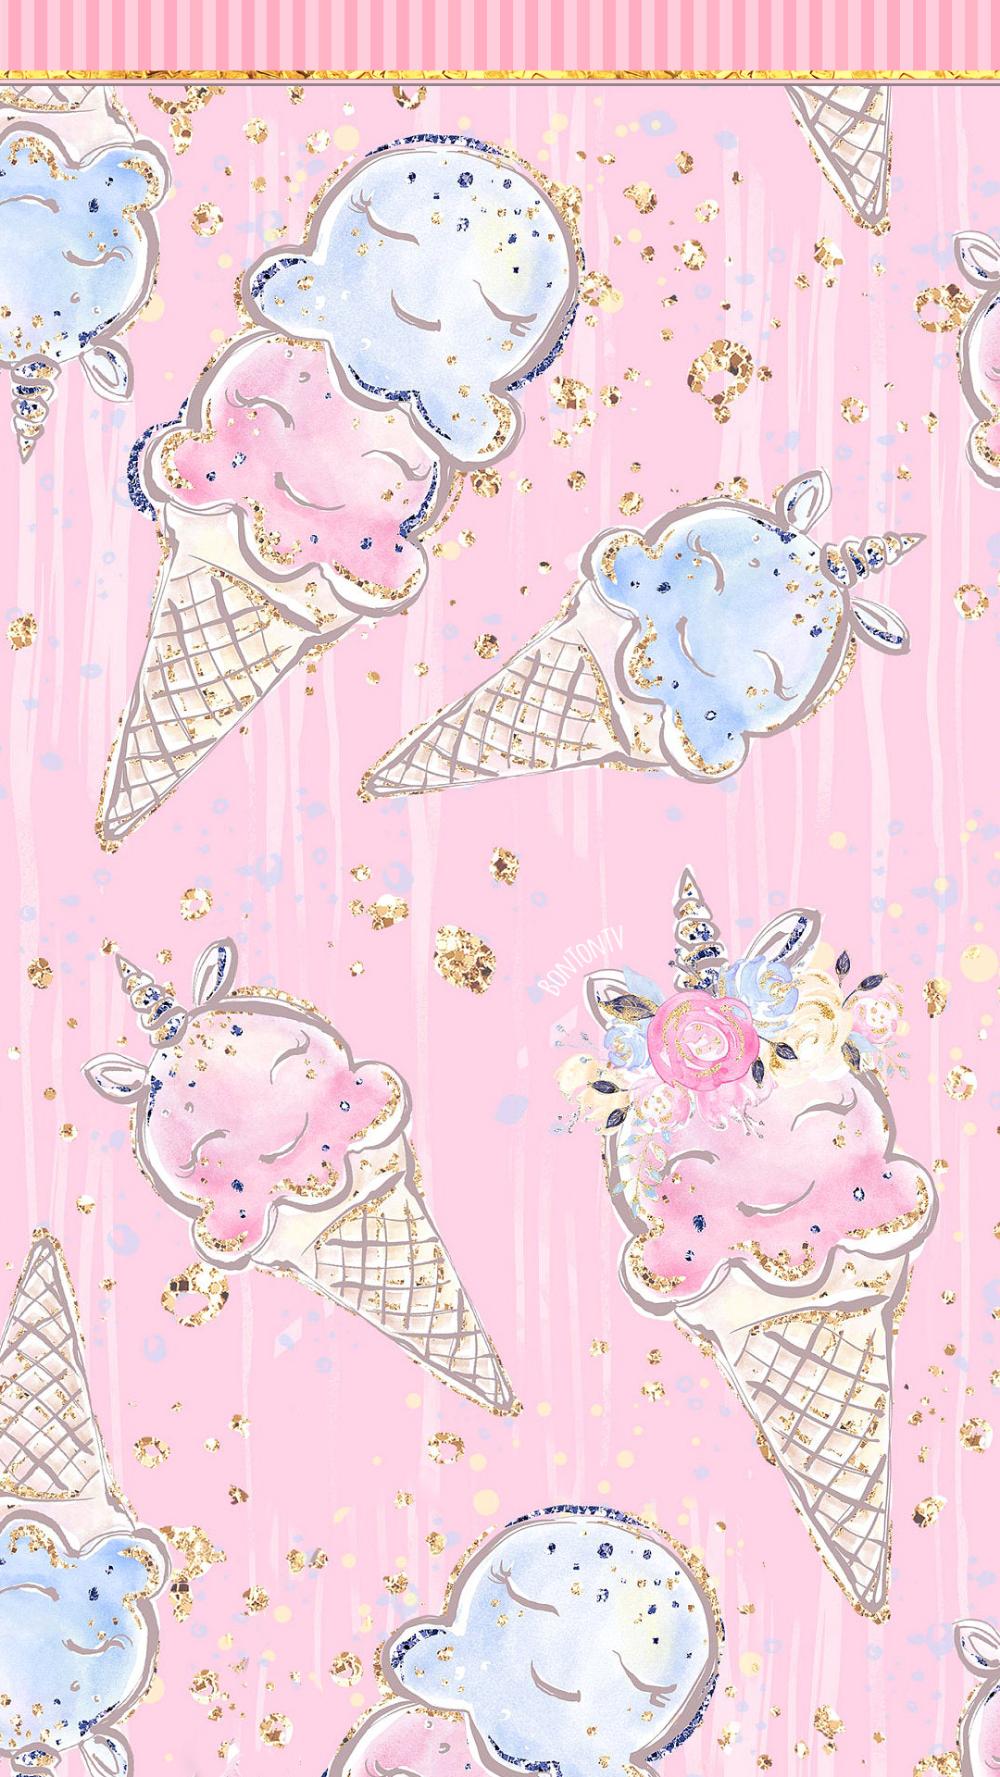 Phone Wallpapers Hd Cute Unicorn Ice Cream Pink Glittery Gold